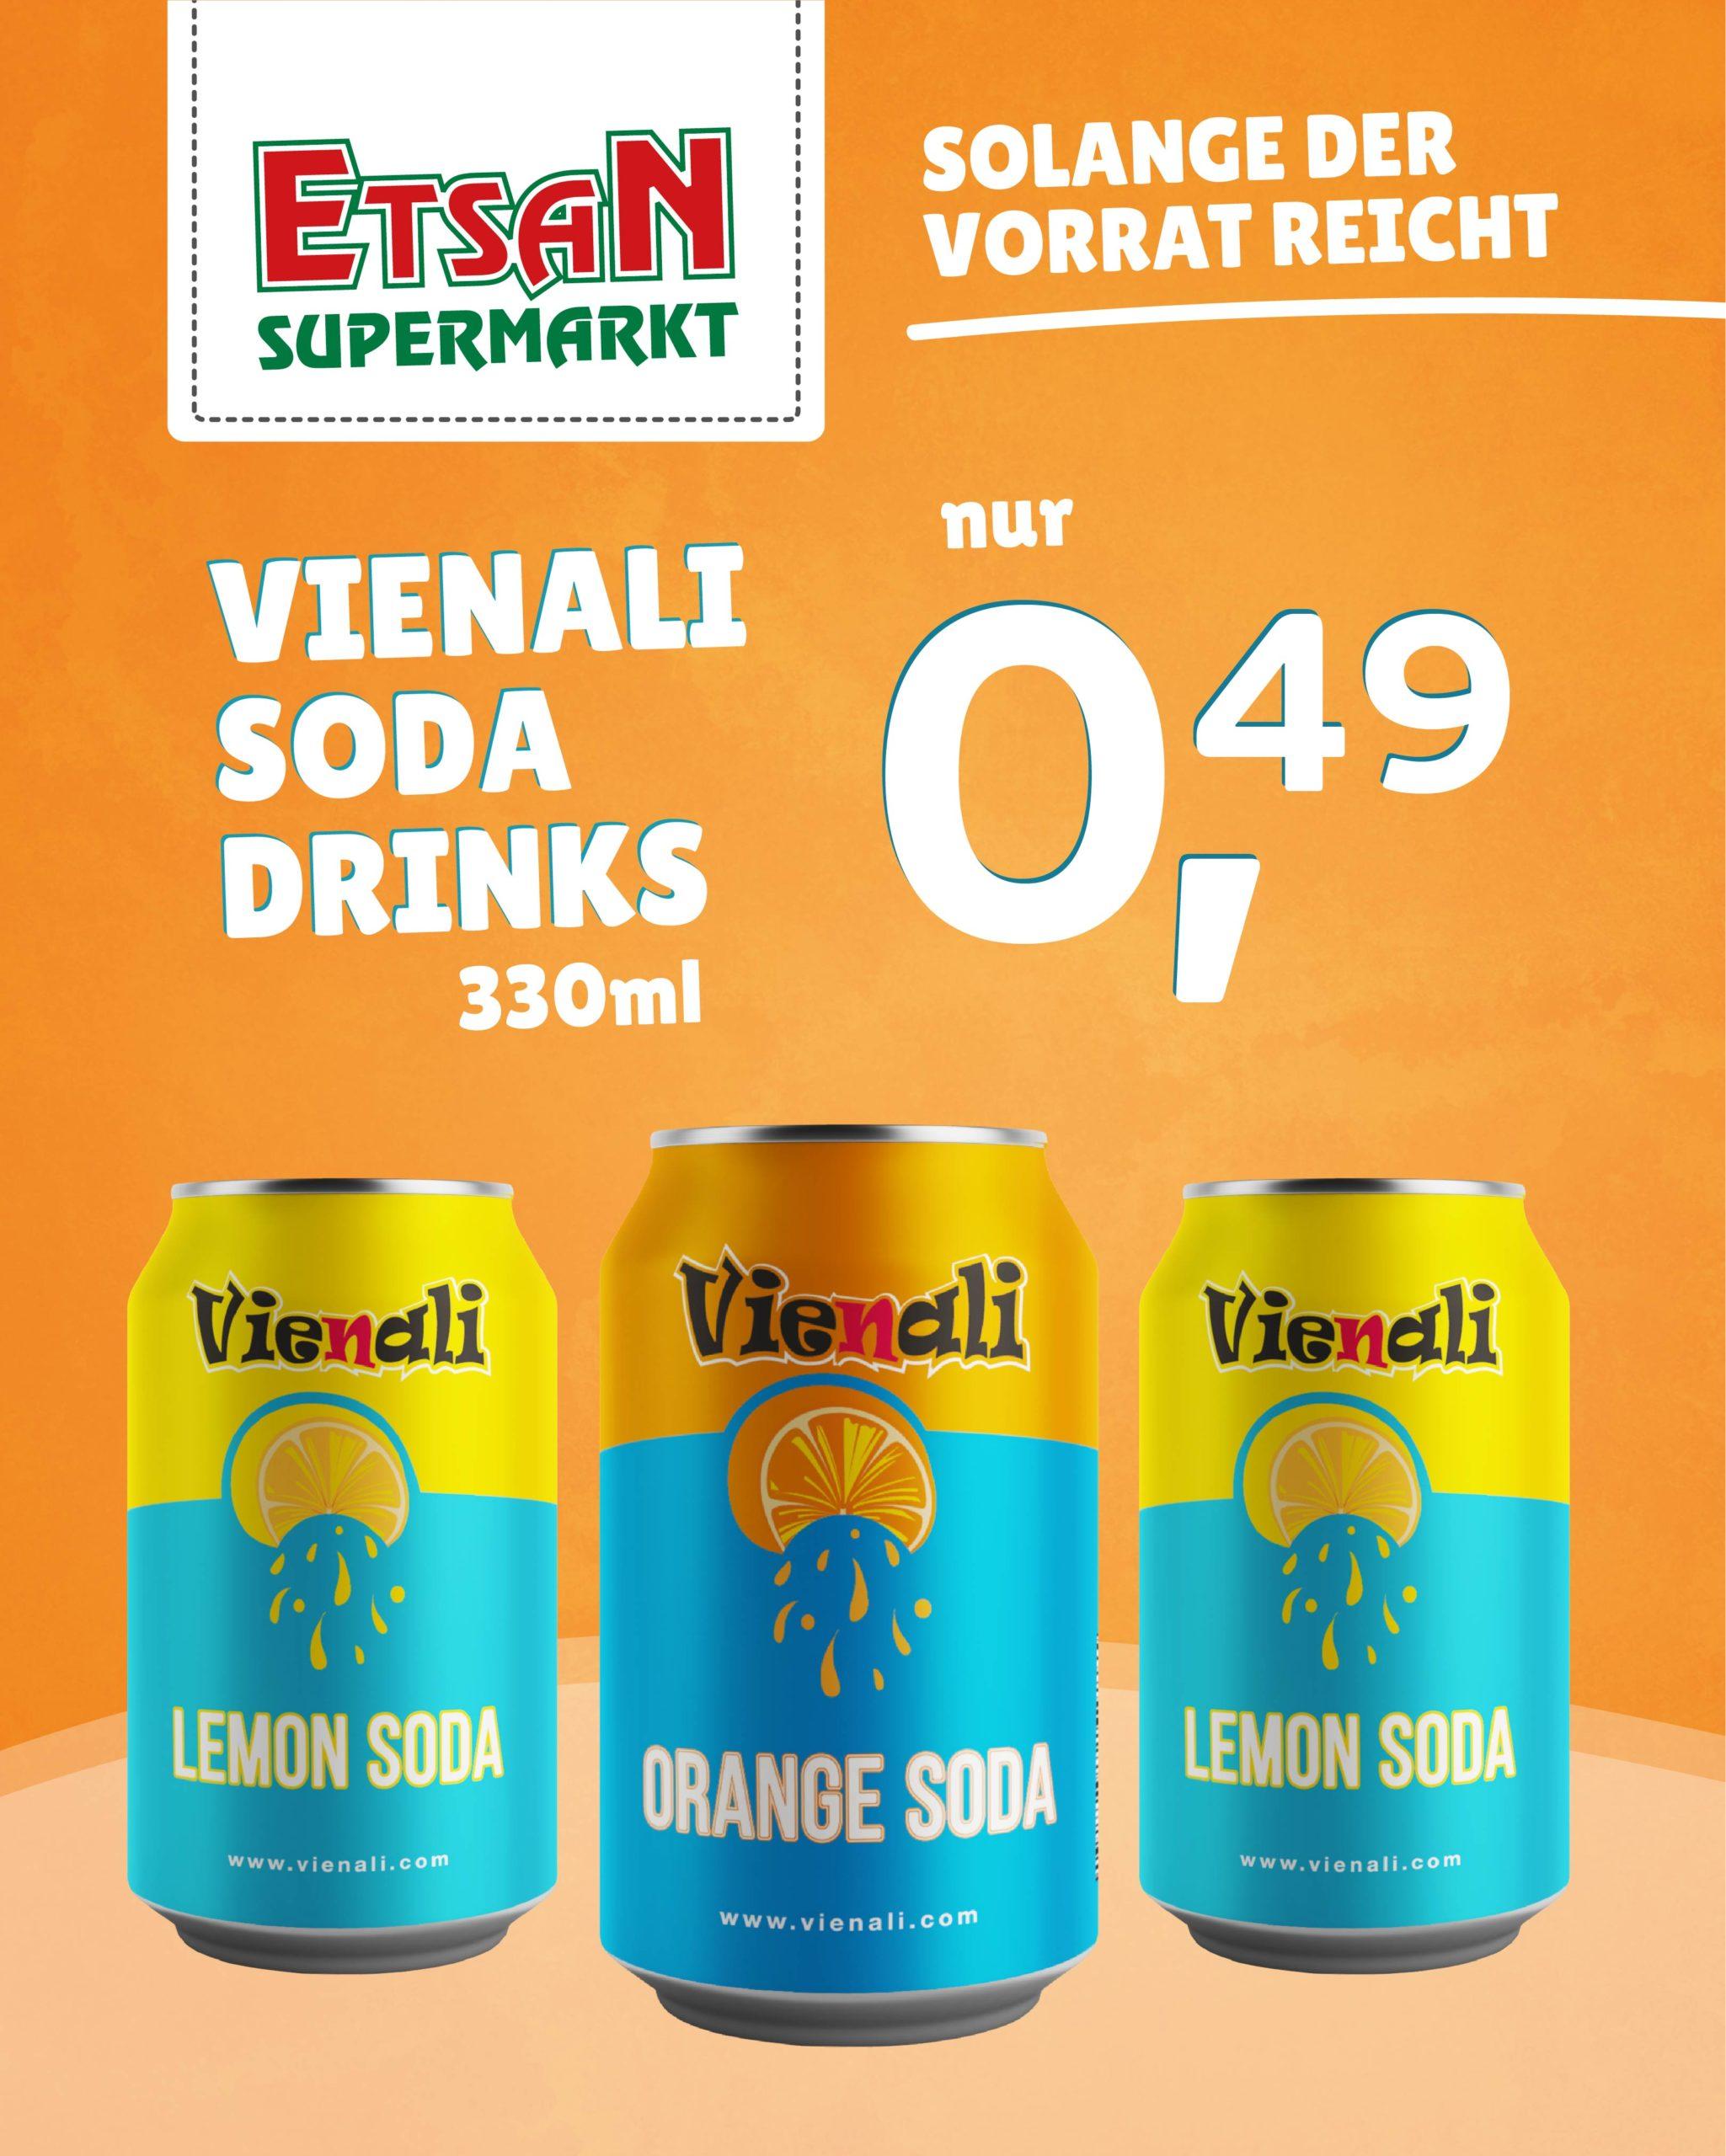 Vienali Soda - Etsan Supermarkt